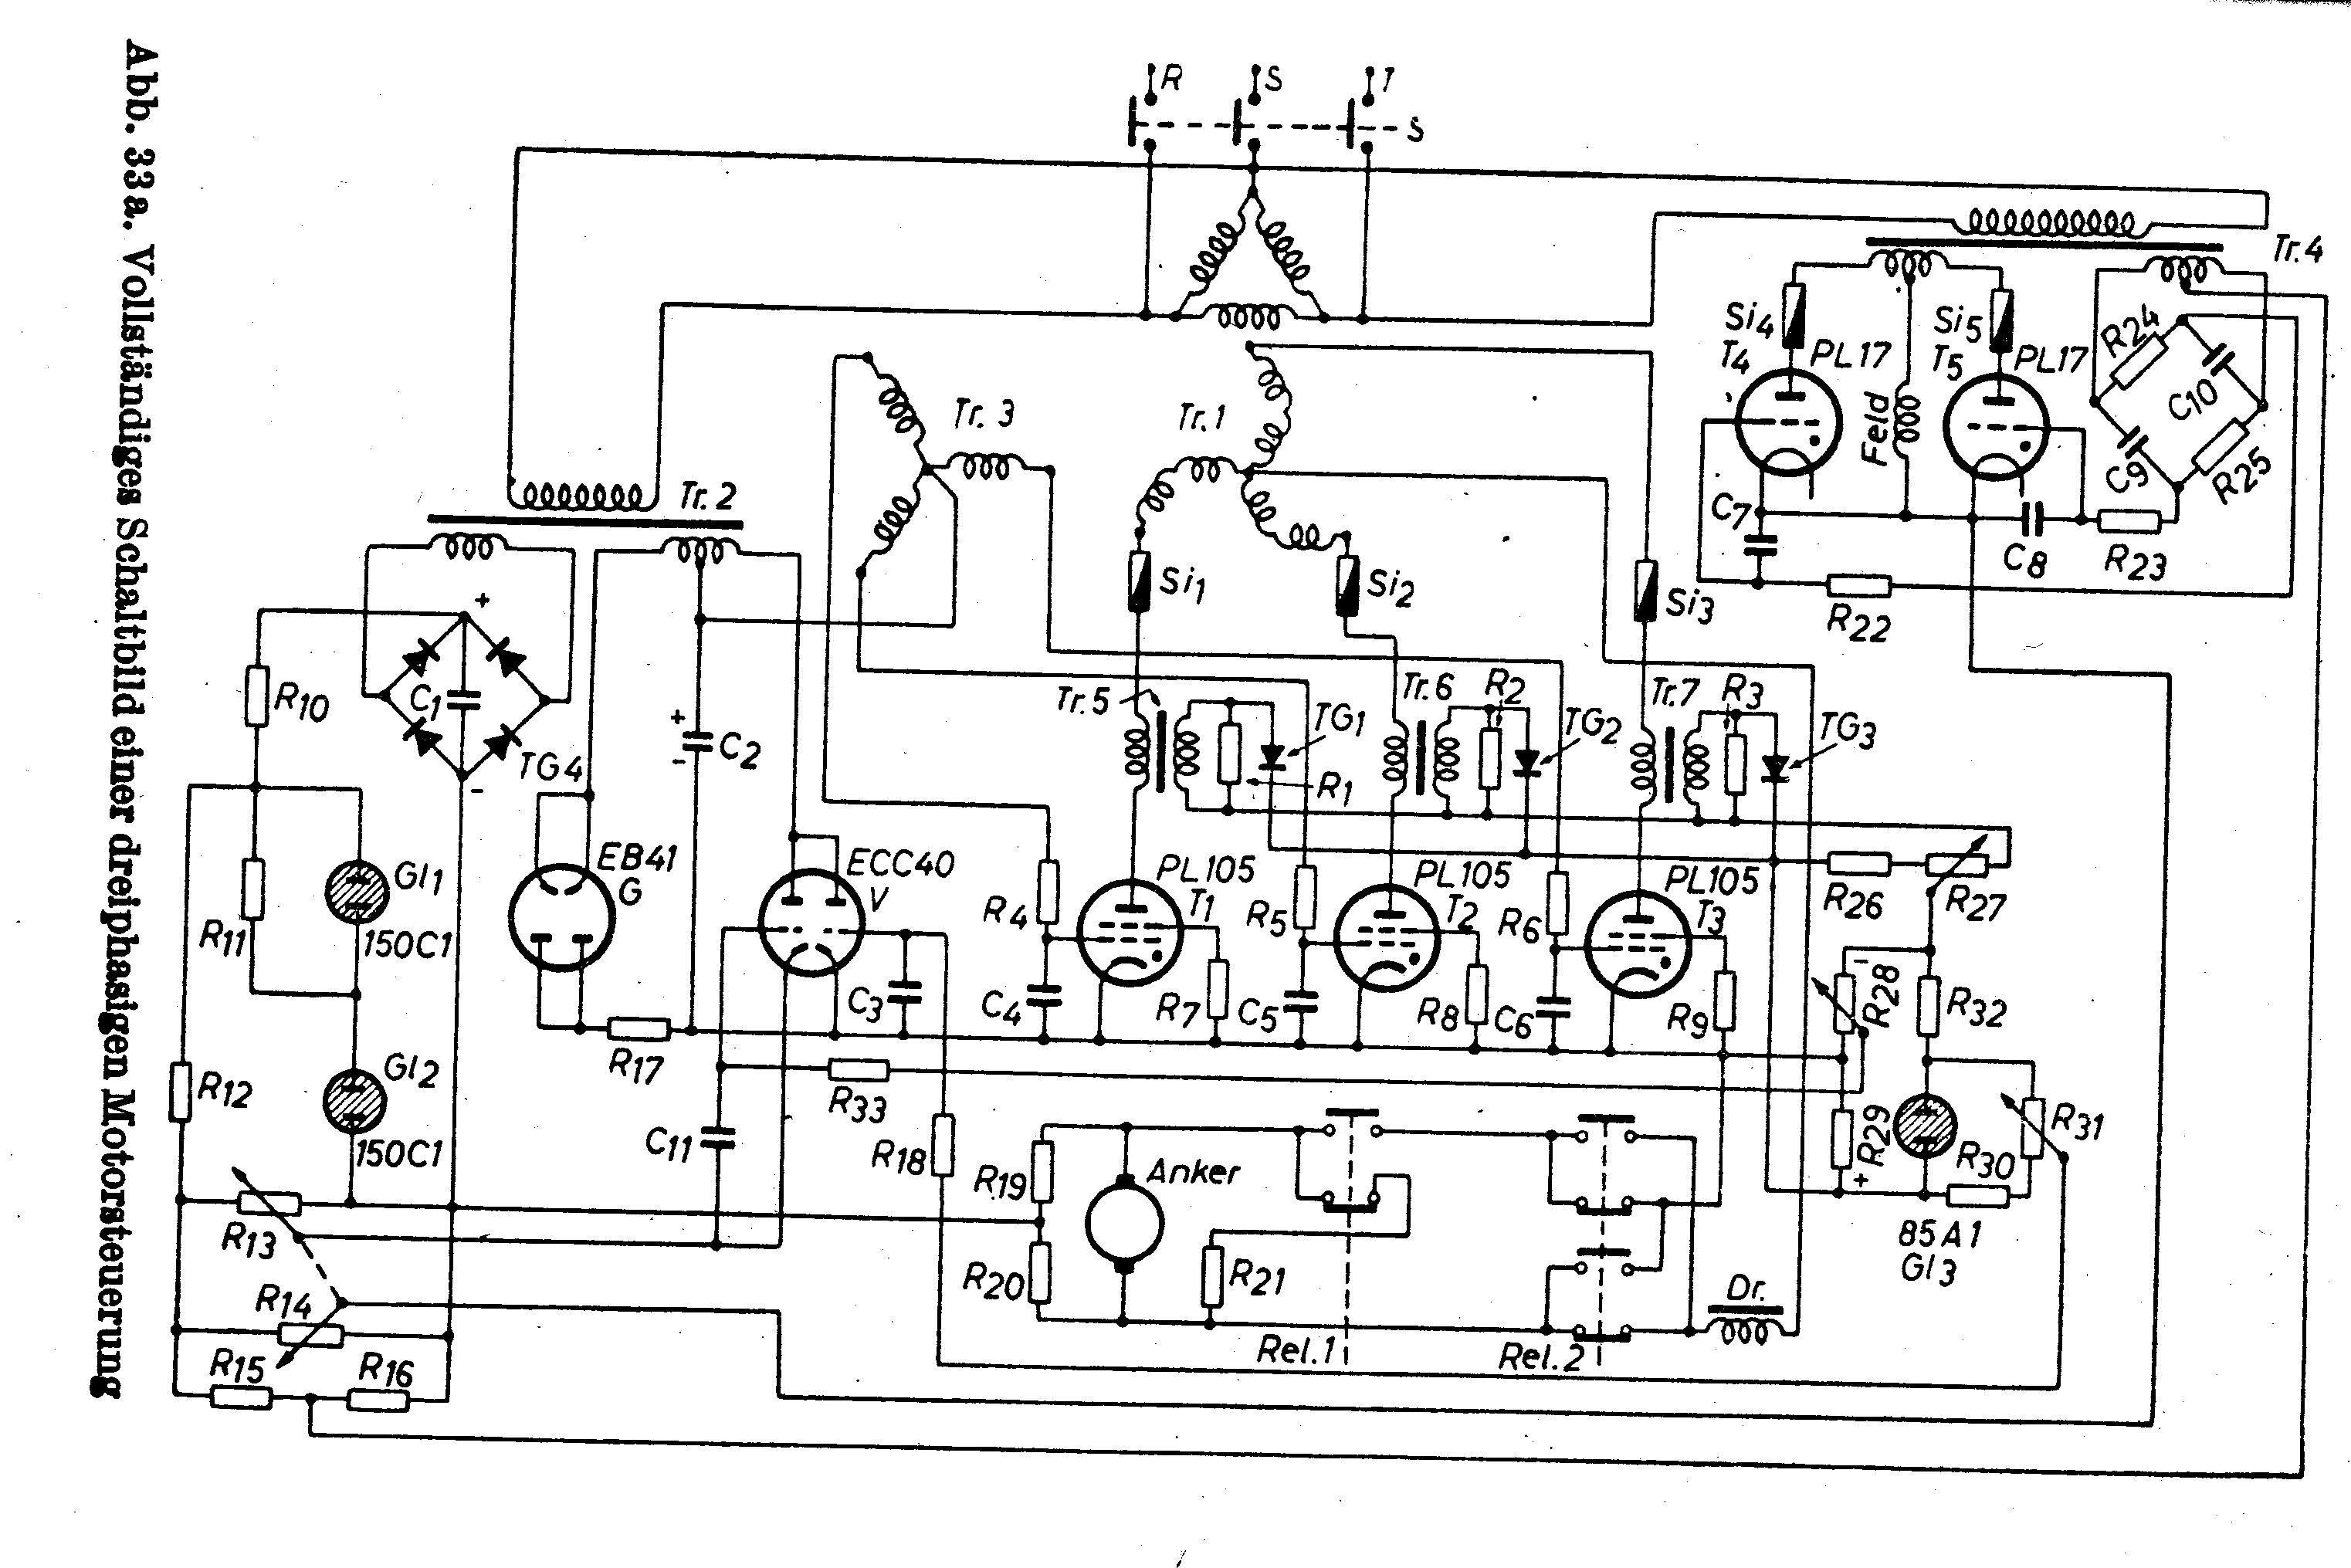 Röhre als Schalter - Mikrocontroller.net